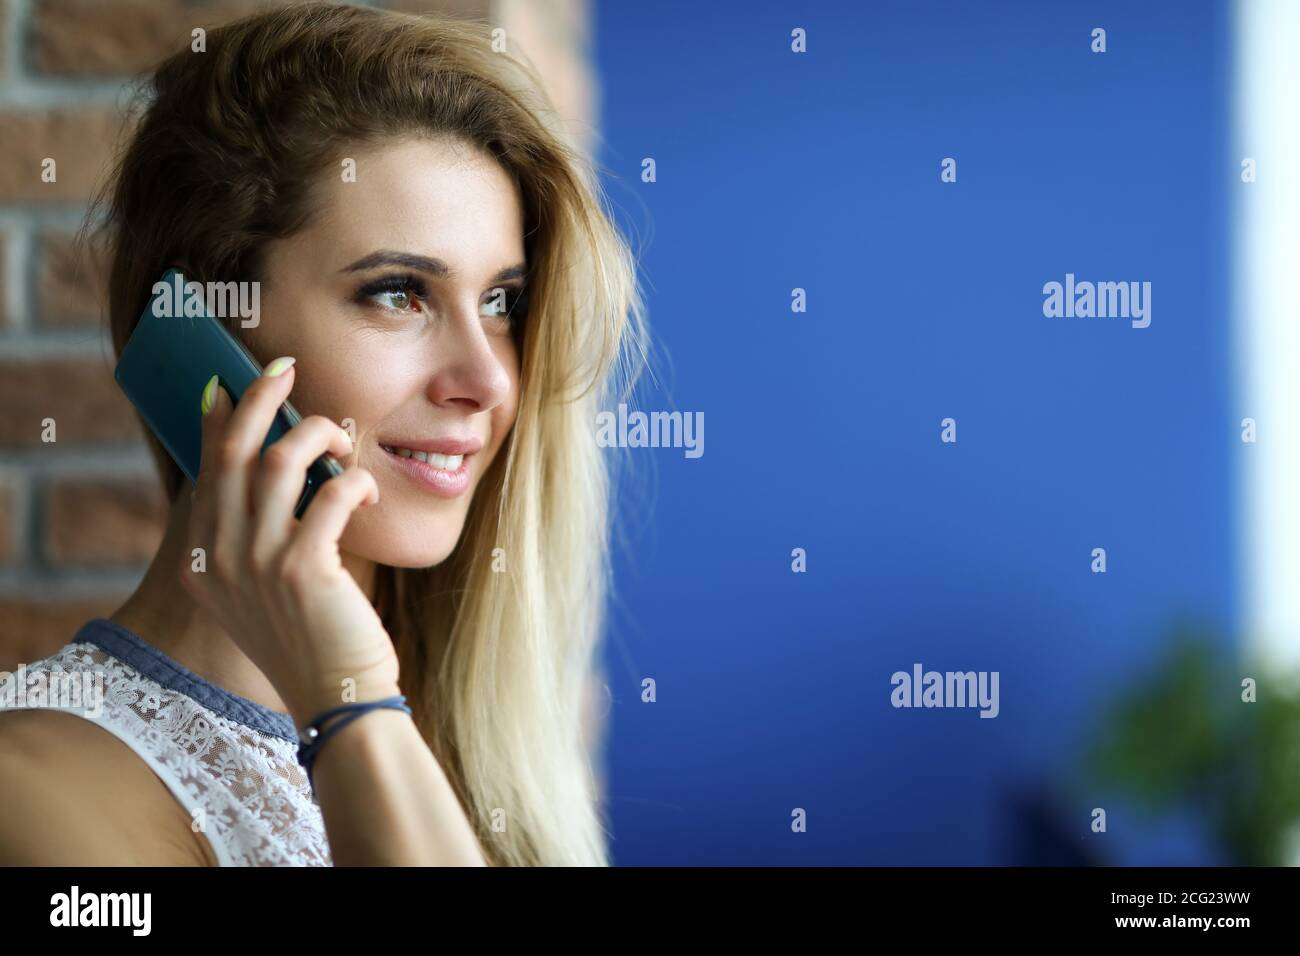 Attractive female posing indoors Stock Photo